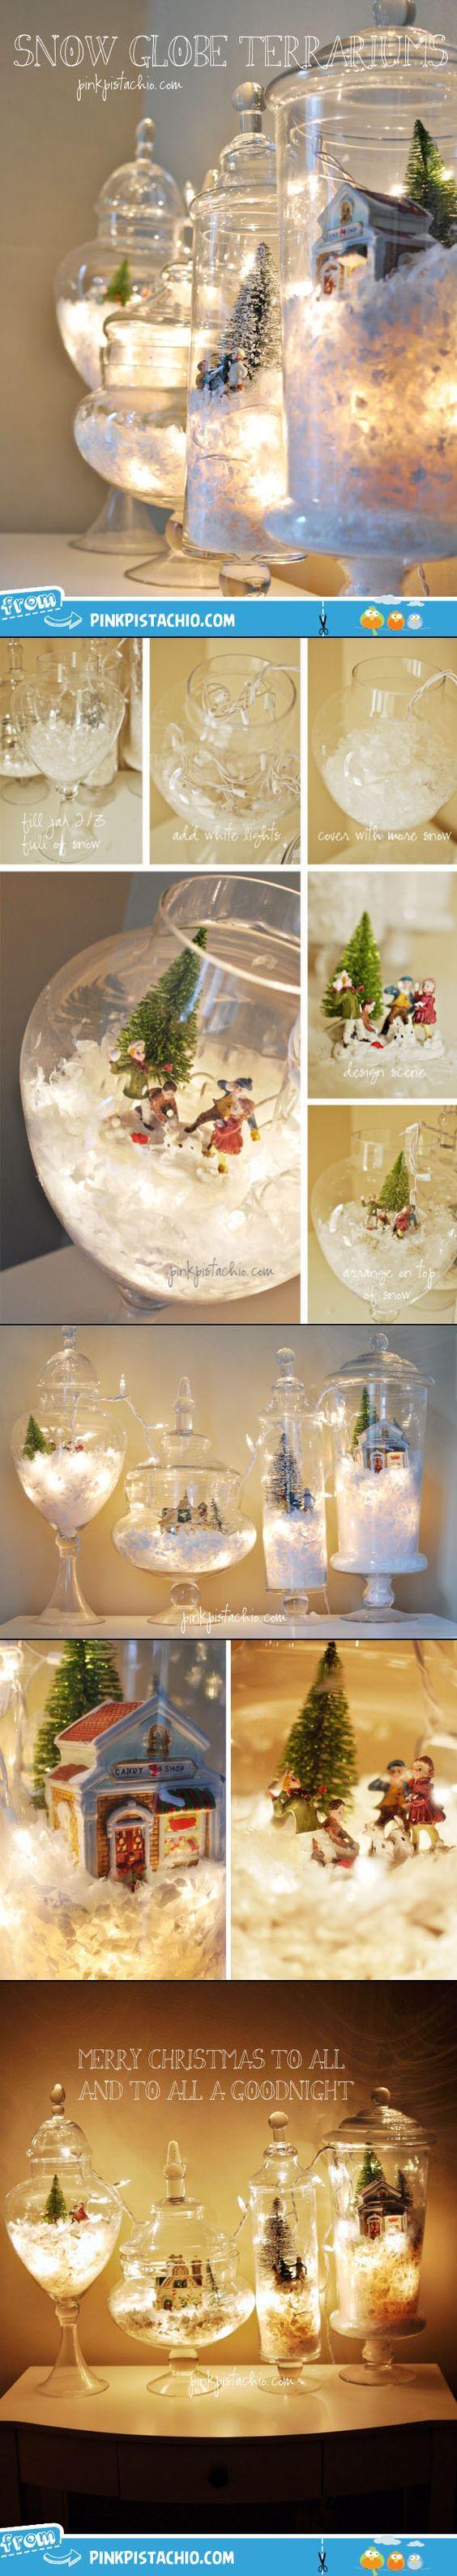 DIY Snow Globe Terrariums.